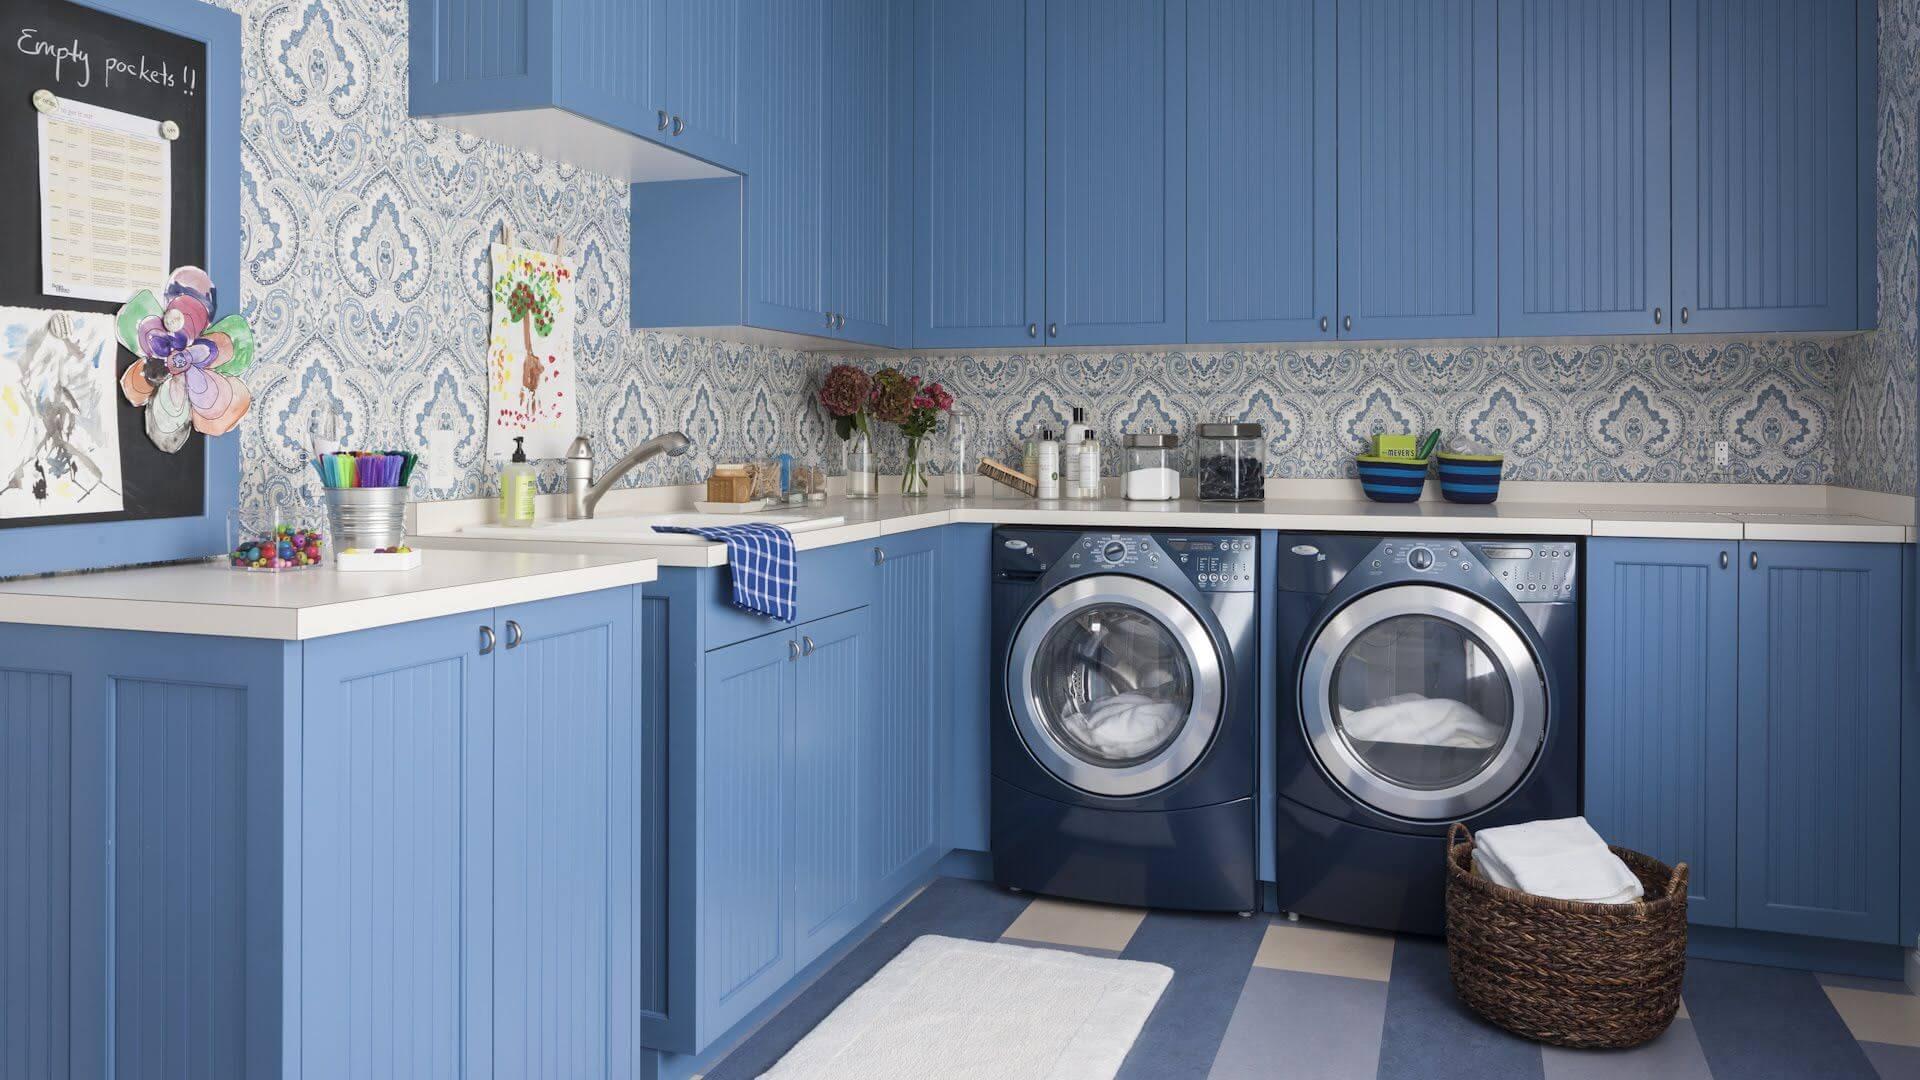 Машинка стиральная на кухне